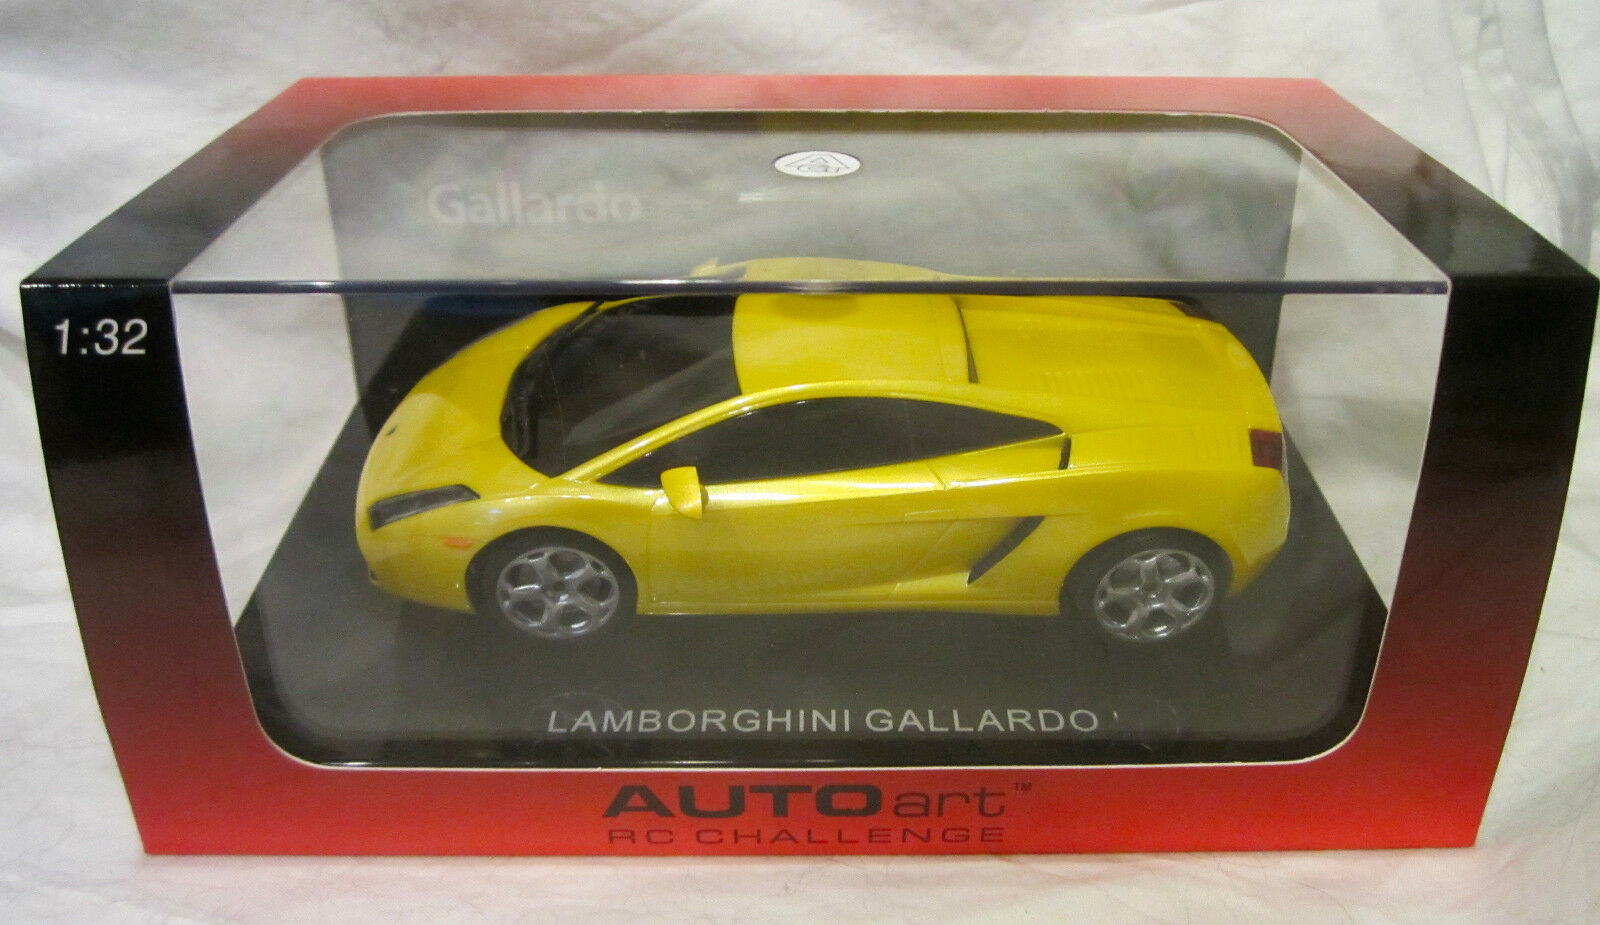 LAMBORGHINI GALLARDO, Yellow - Auto Art RC Challenge - 1 32 Scale Die Cast Car